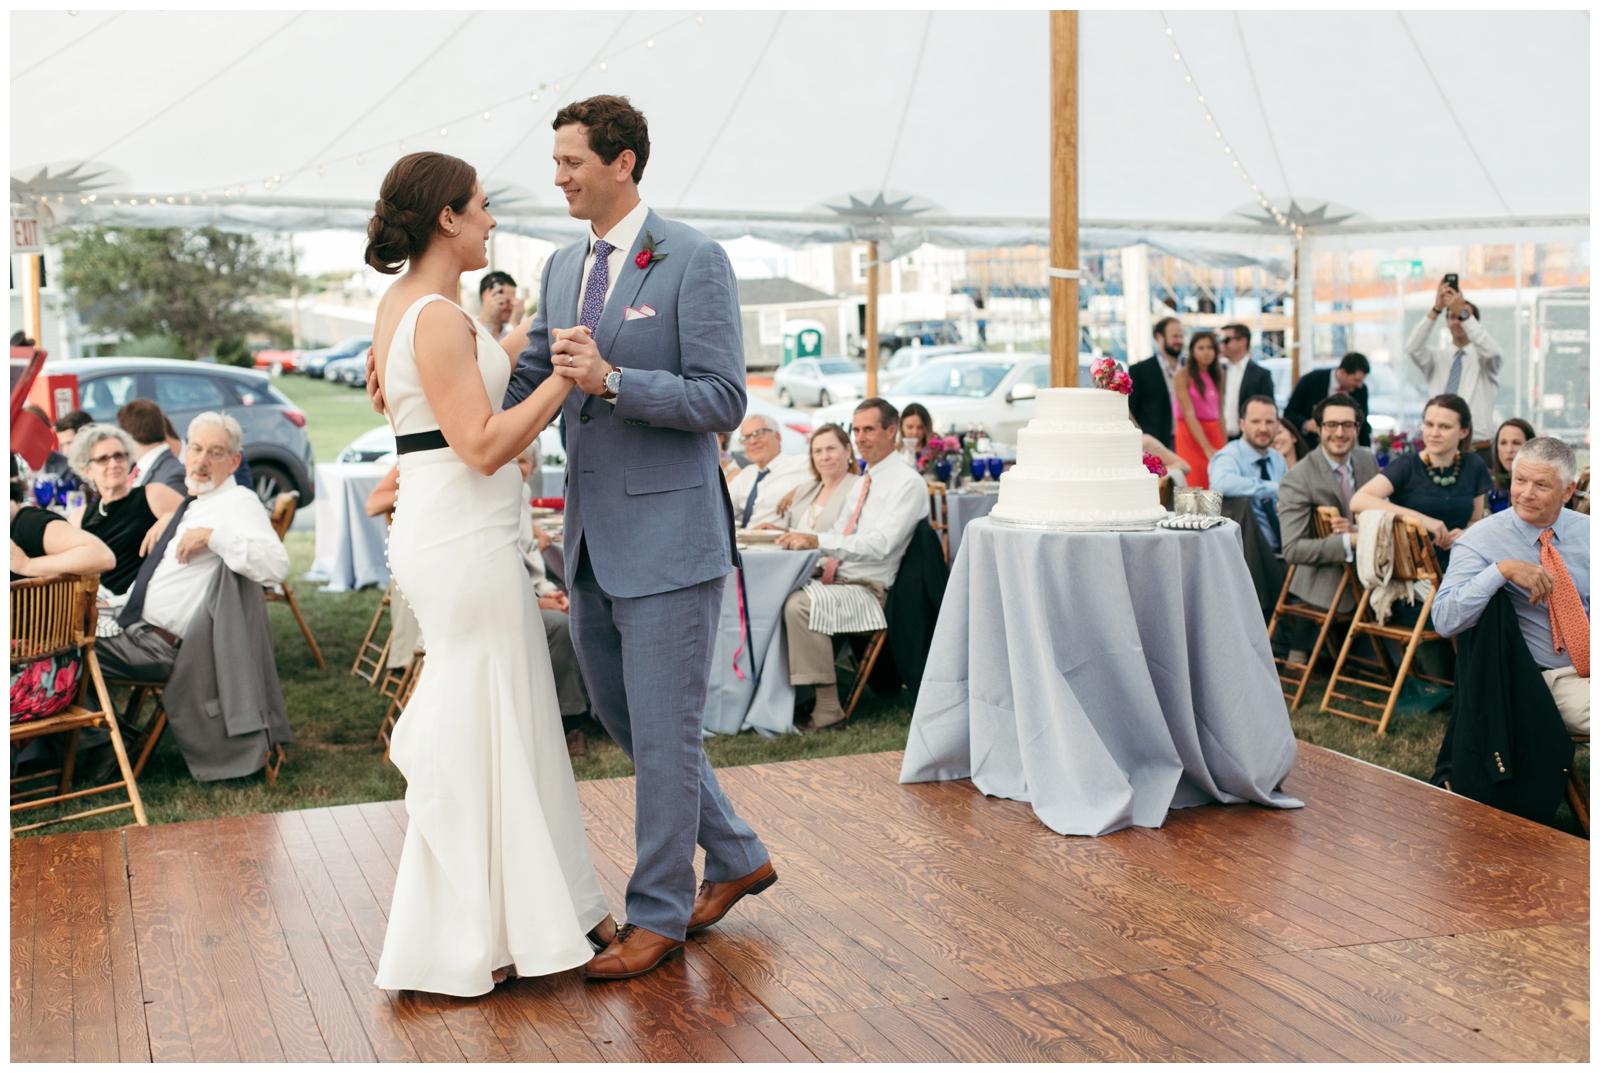 Bailey-Q-Photo-Backyard-Wedding-South-Shore-Boston-Wedding-Photographer-093.jpg